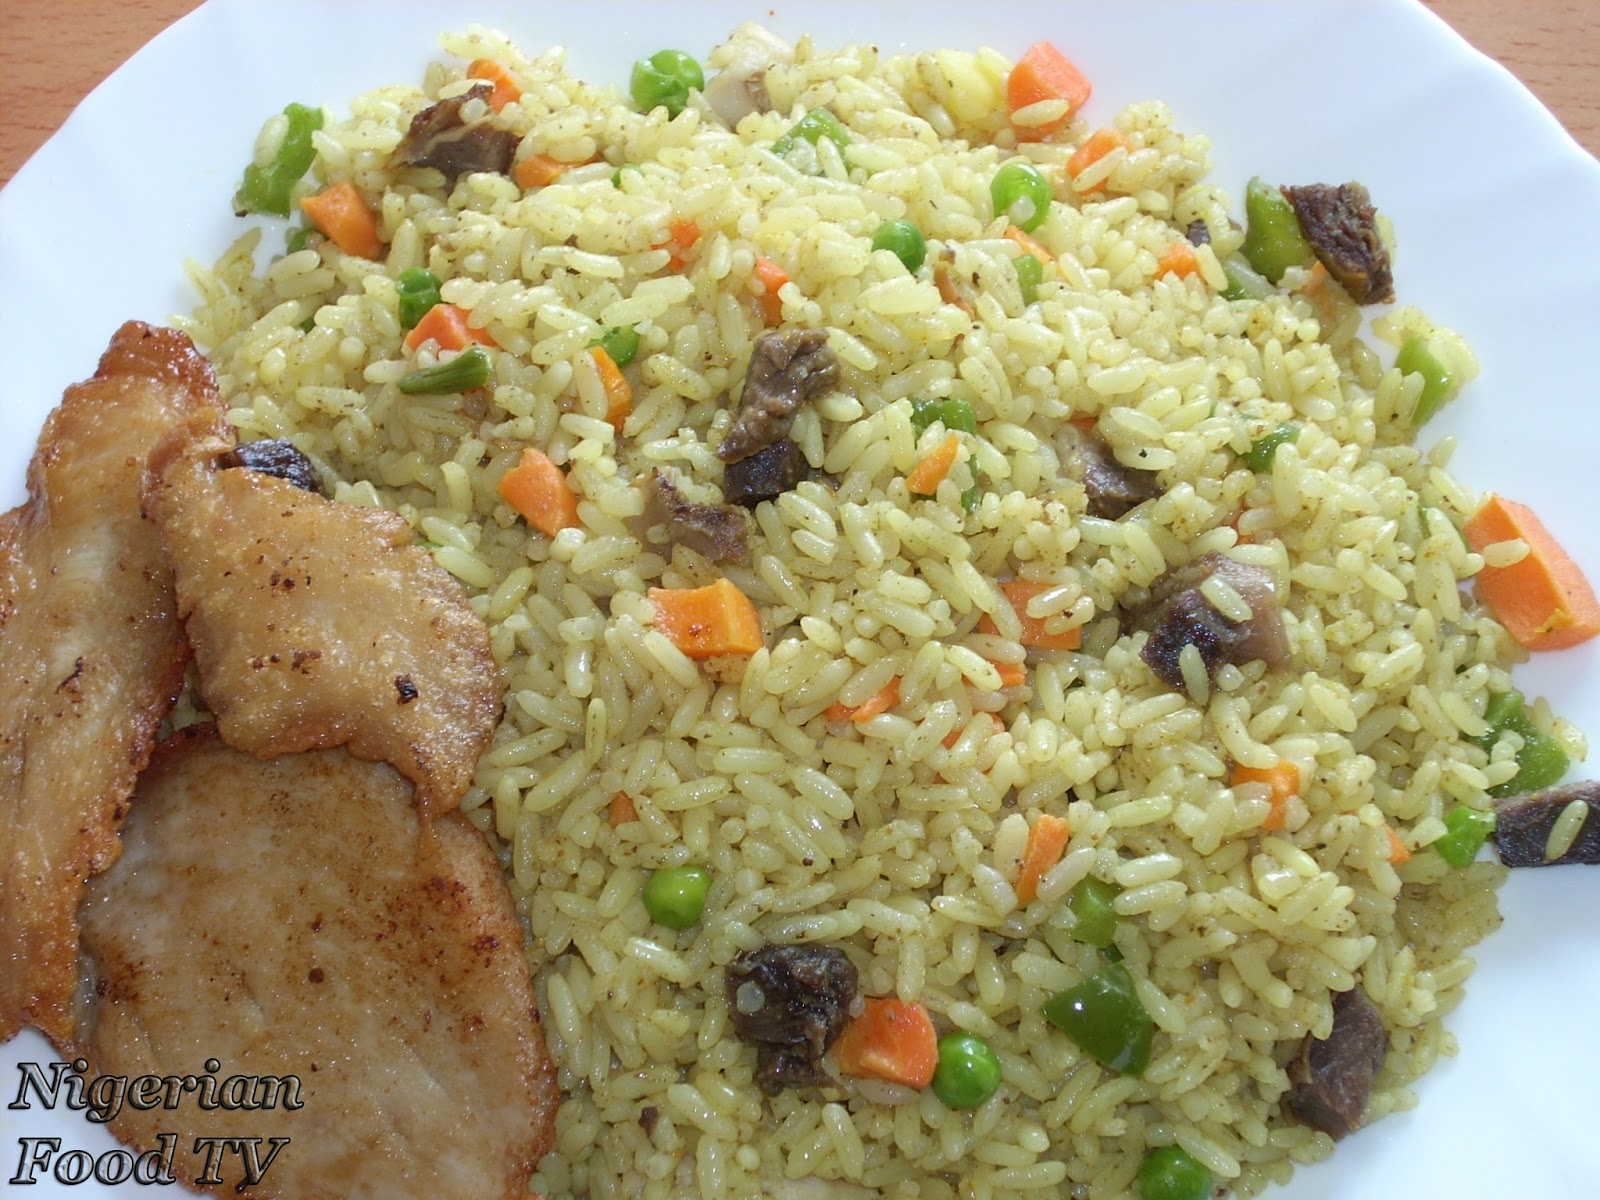 Nigerian Rice Recipes, Nigerian Rice meal ideas, nigerian rice, nigerian food tv, nigerian cuisine